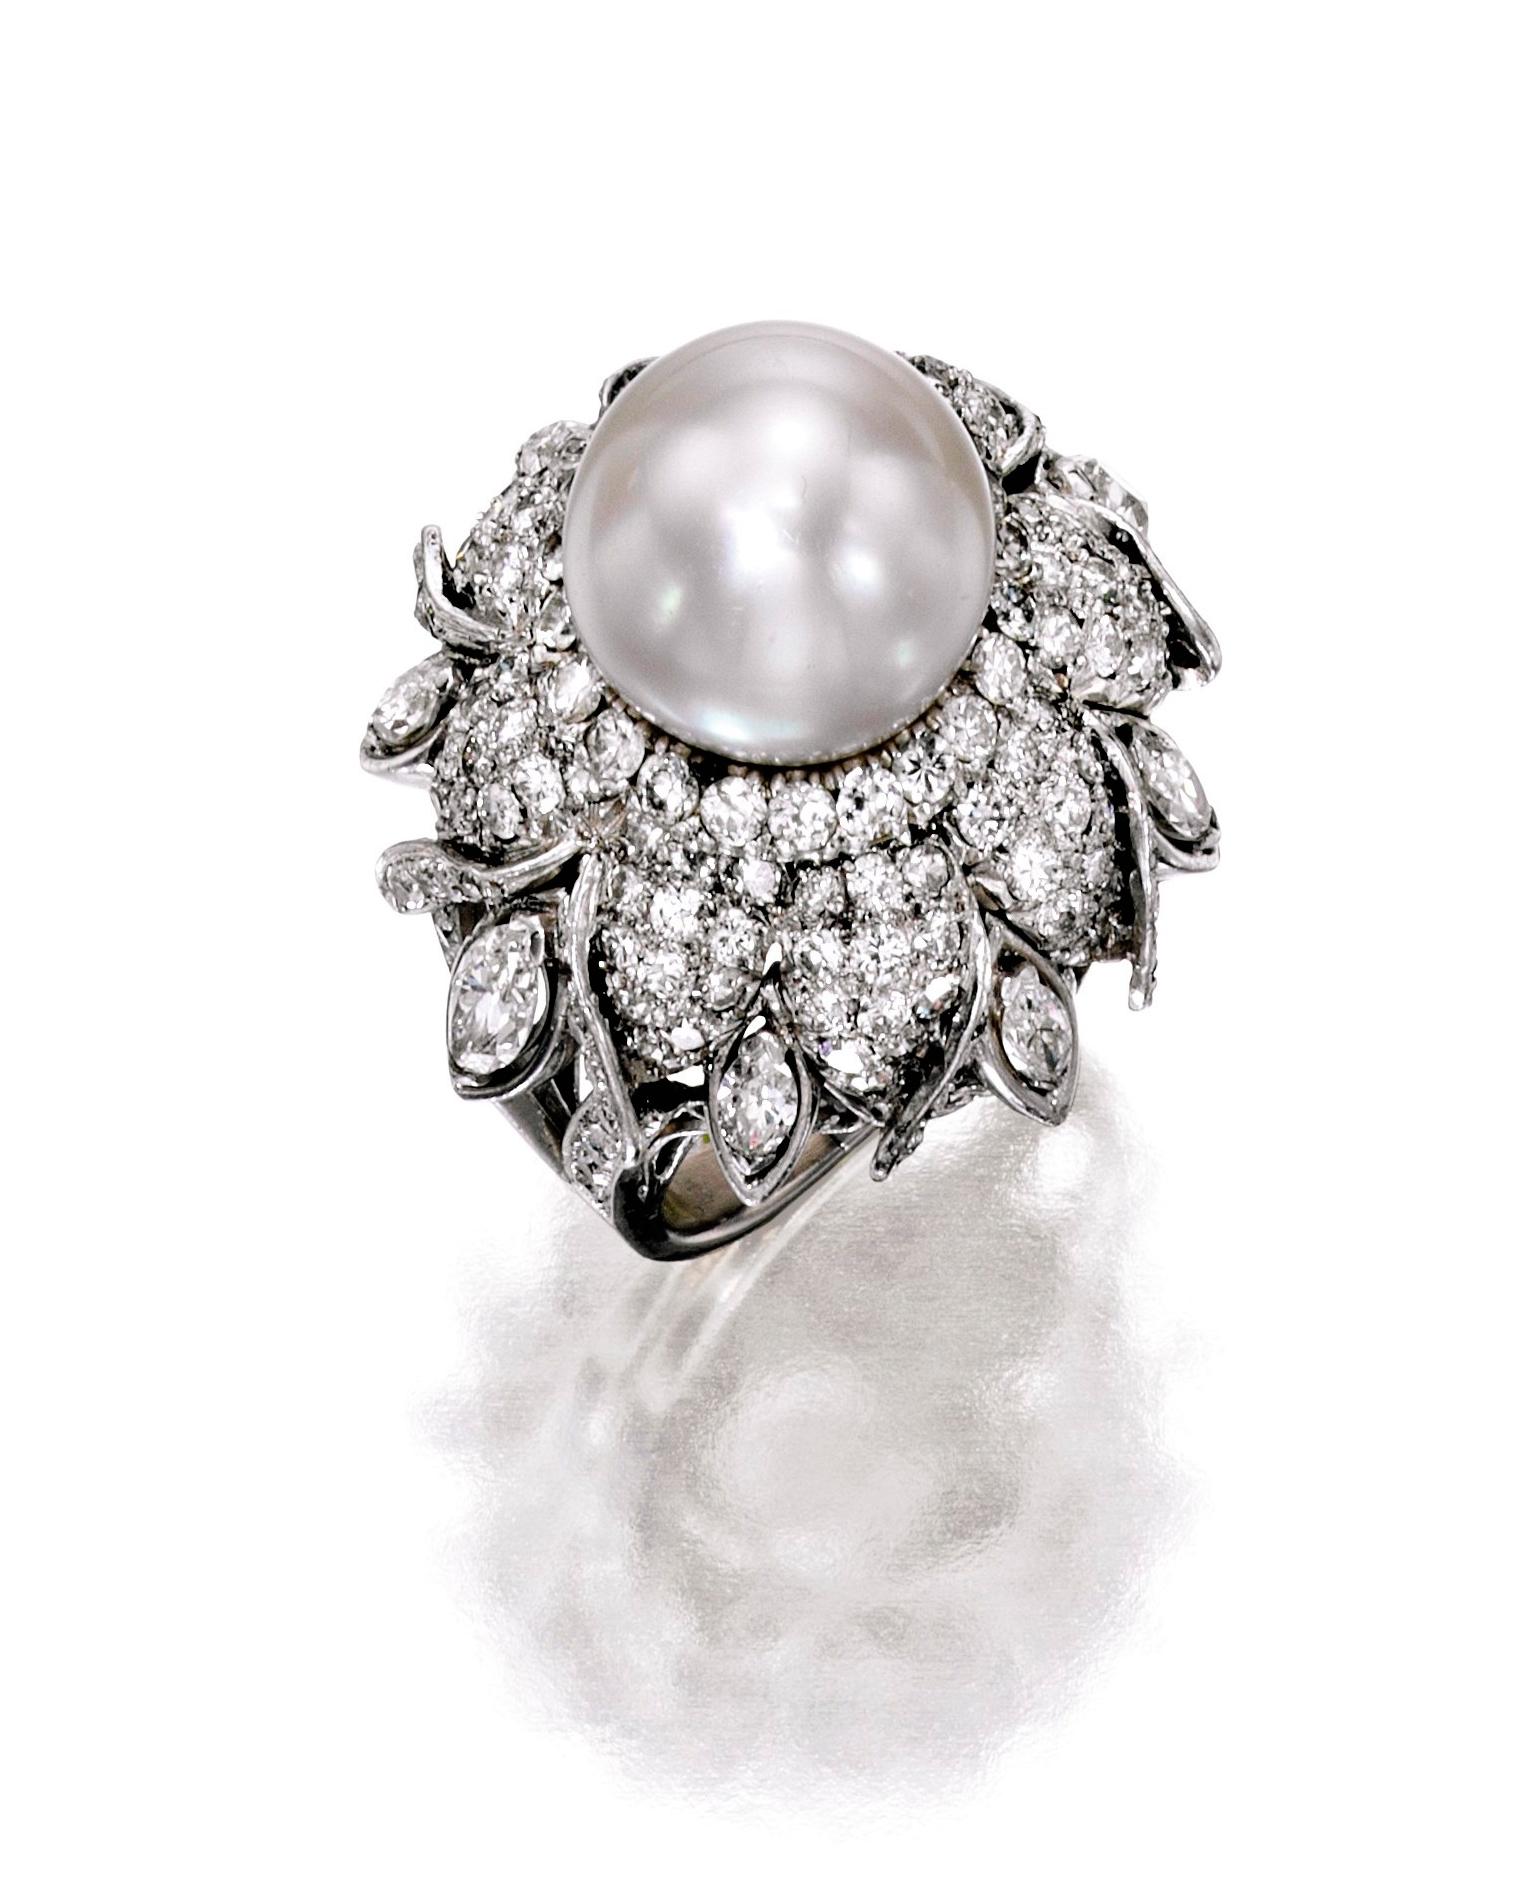 sothebys-ebay-auction-9331-lot-199-0415.jpg